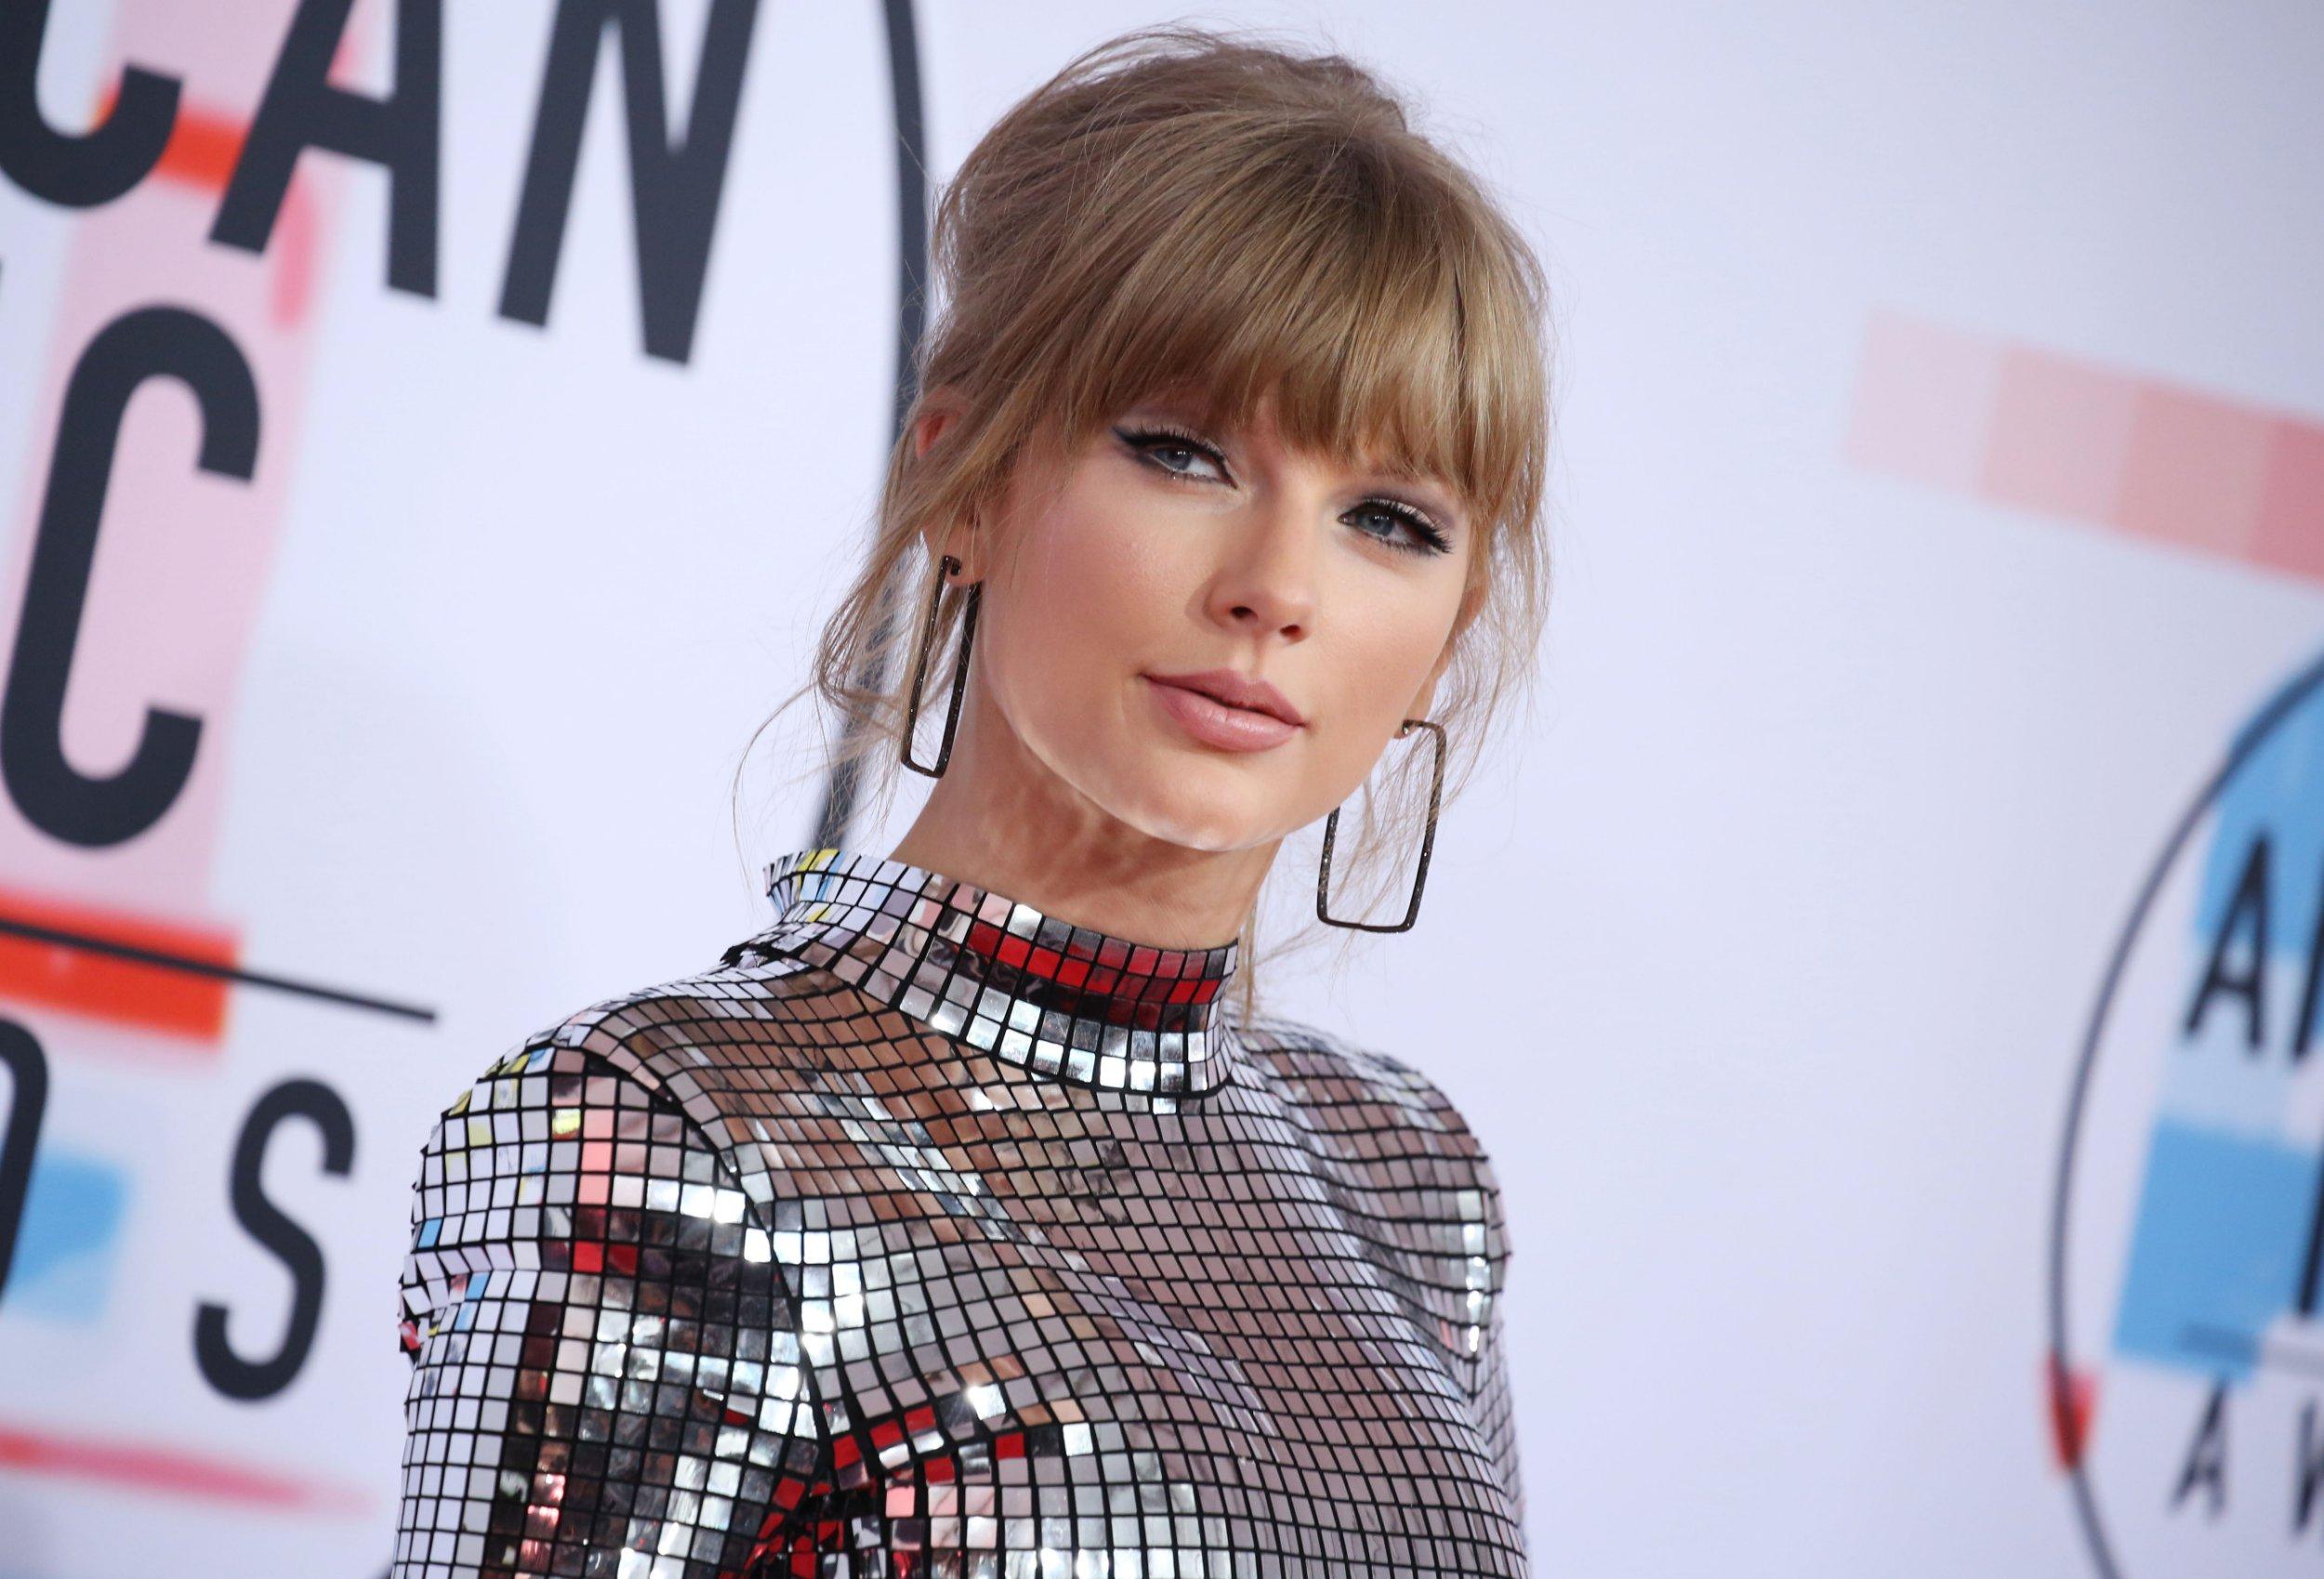 Mandatory Credit: Photo by Matt Baron/REX/Shutterstock (9919808ki) Taylor Swift American Music Awards, Arrivals, Los Angeles, USA - 09 Oct 2018